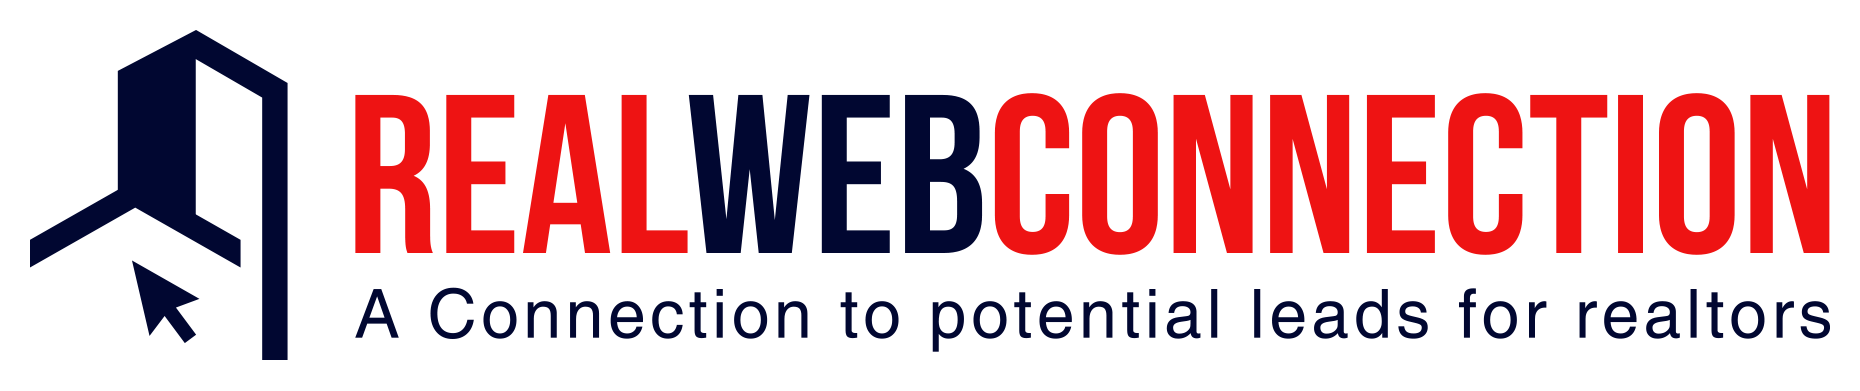 Real Web Connection (SHAJ Infotech Inc)